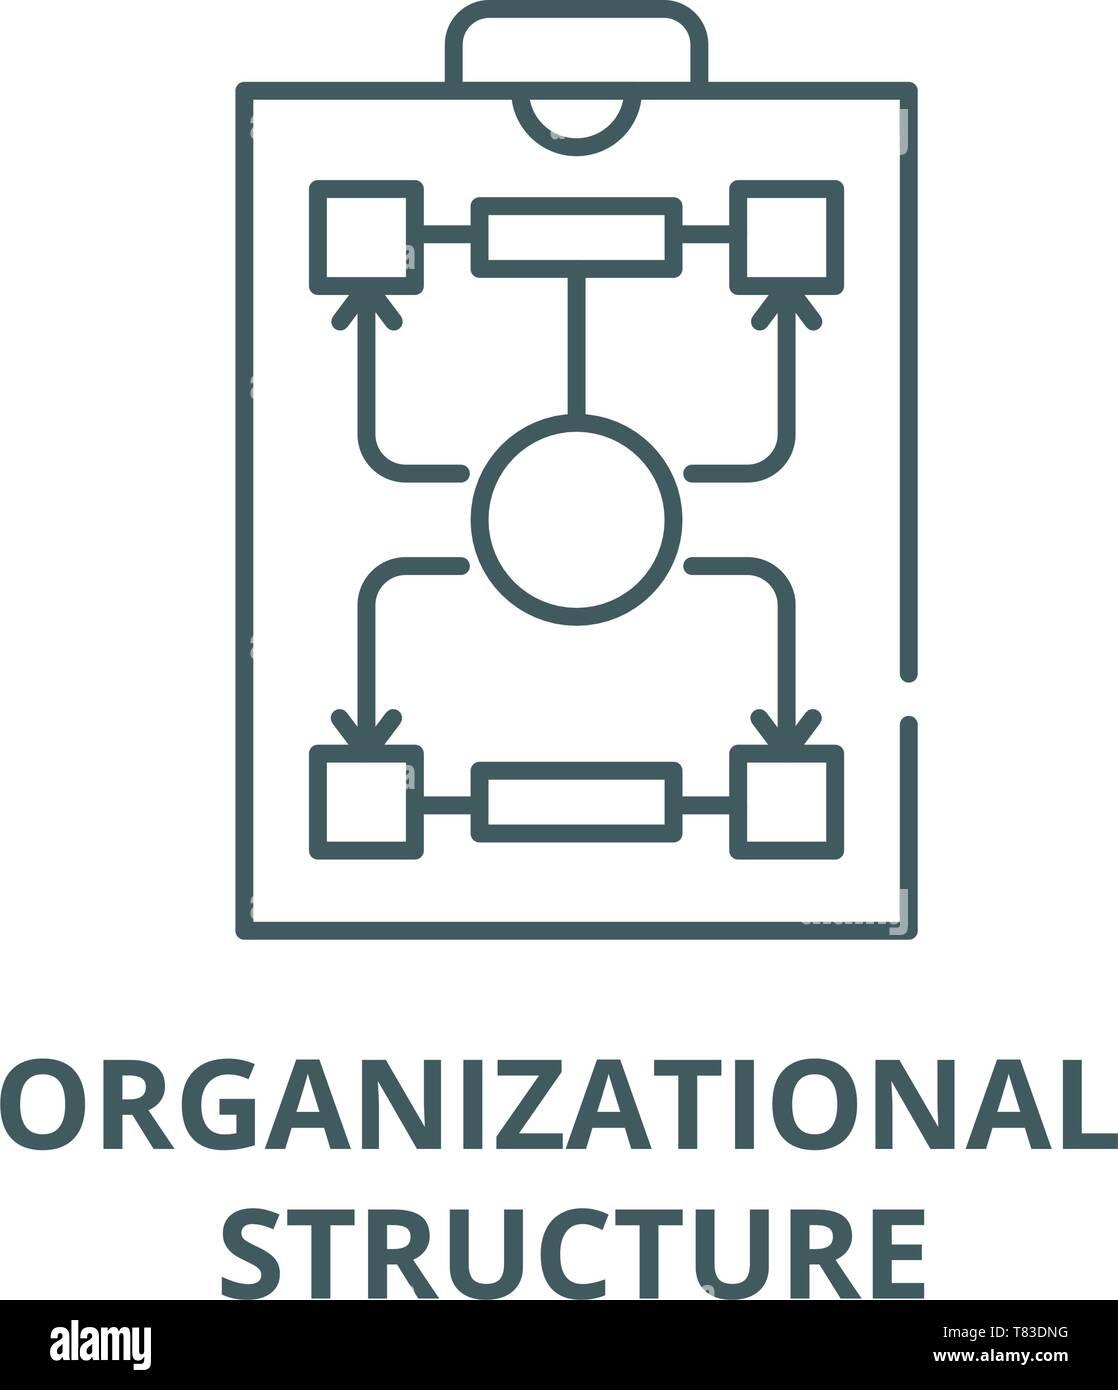 Estructura Organizativa Línea Vector Icono Concepto Lineal